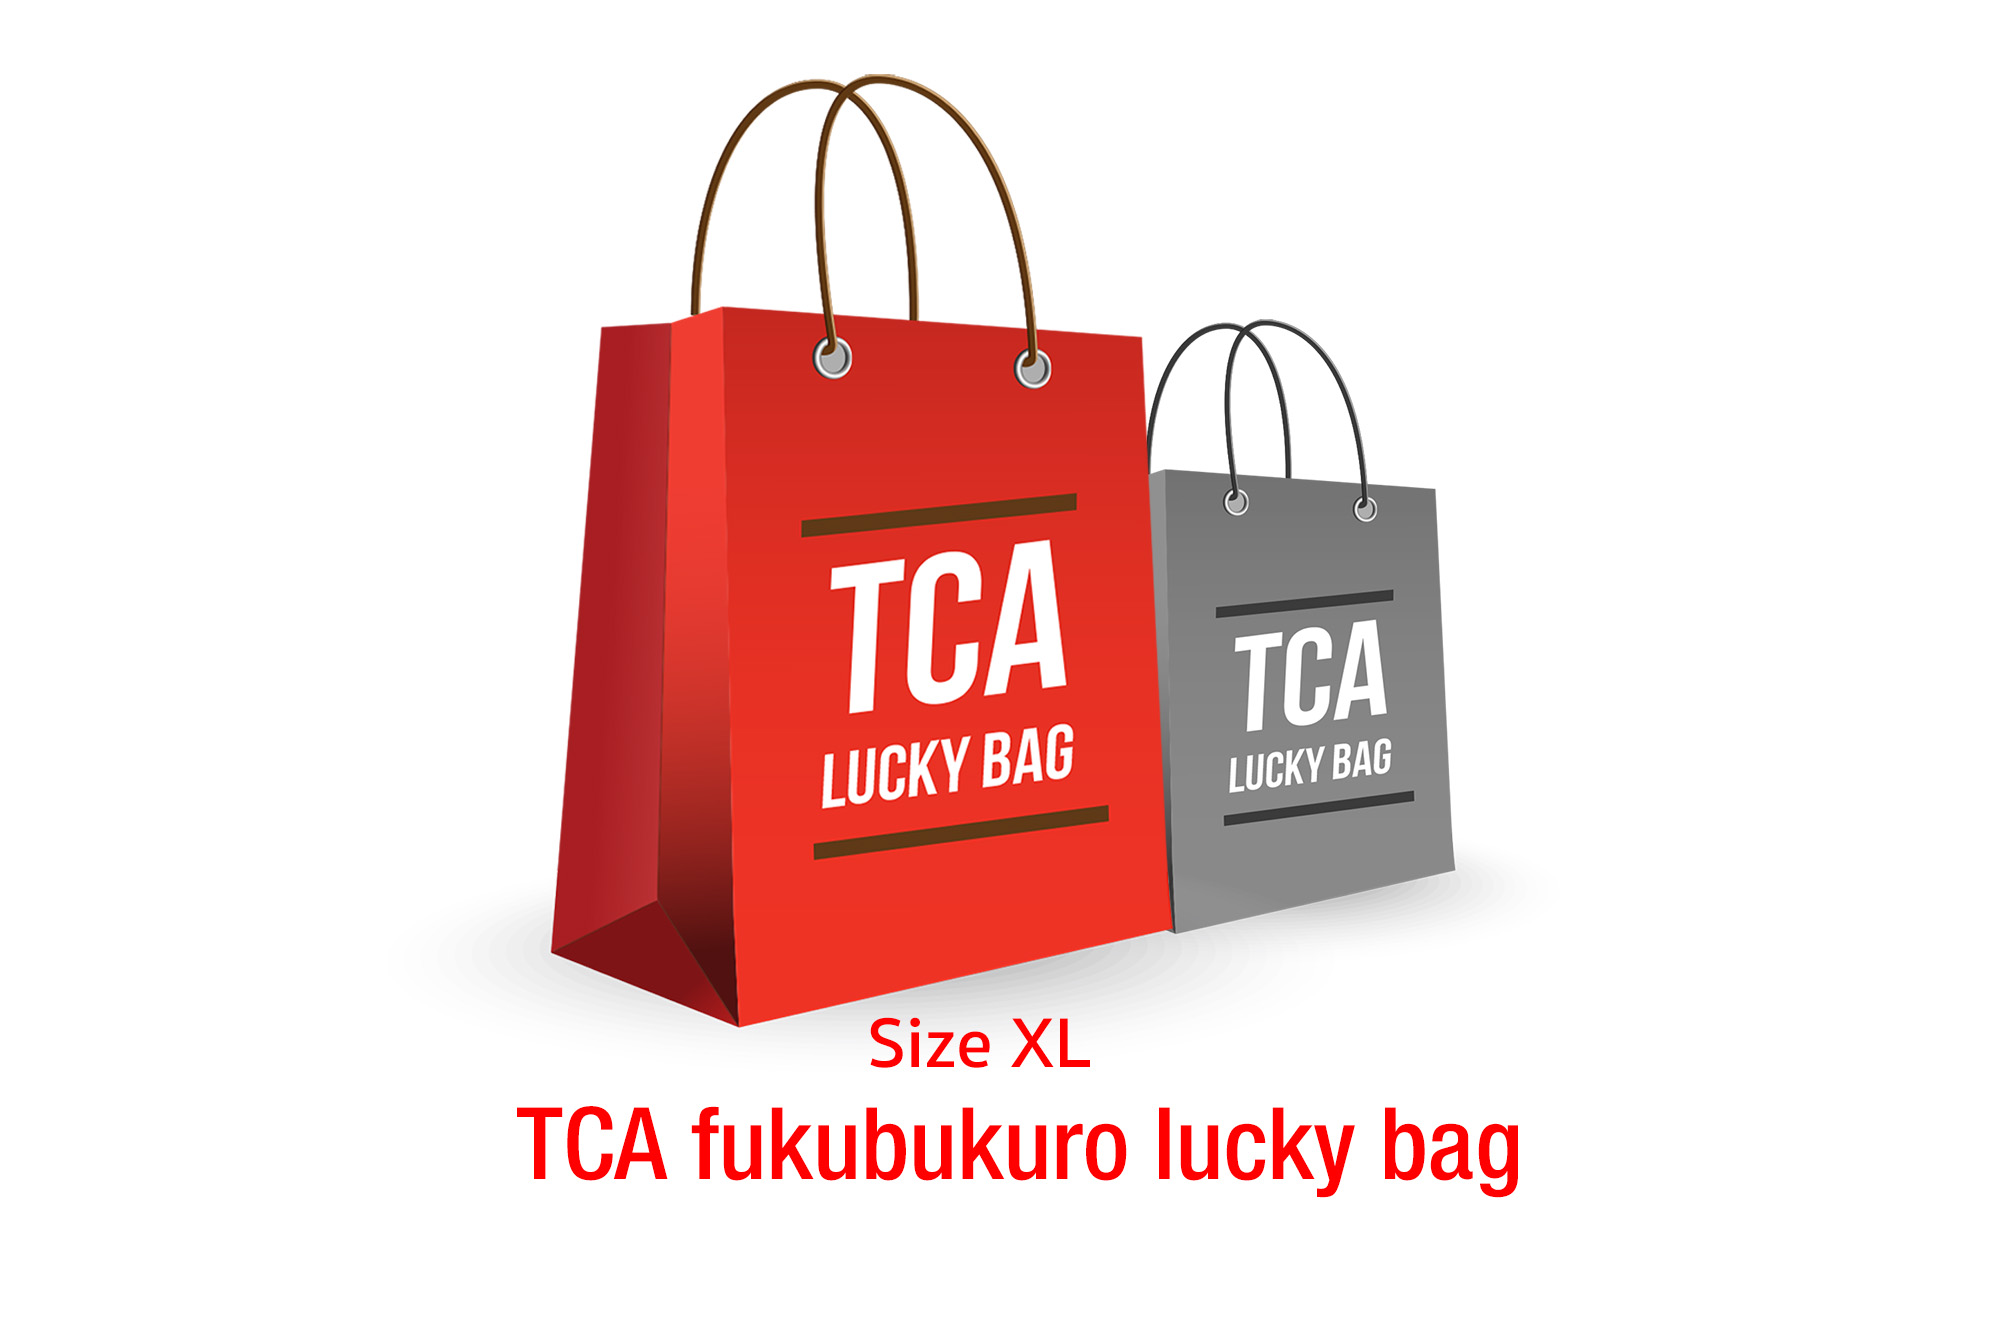 TCA fukubukuro lucky bag | XL size